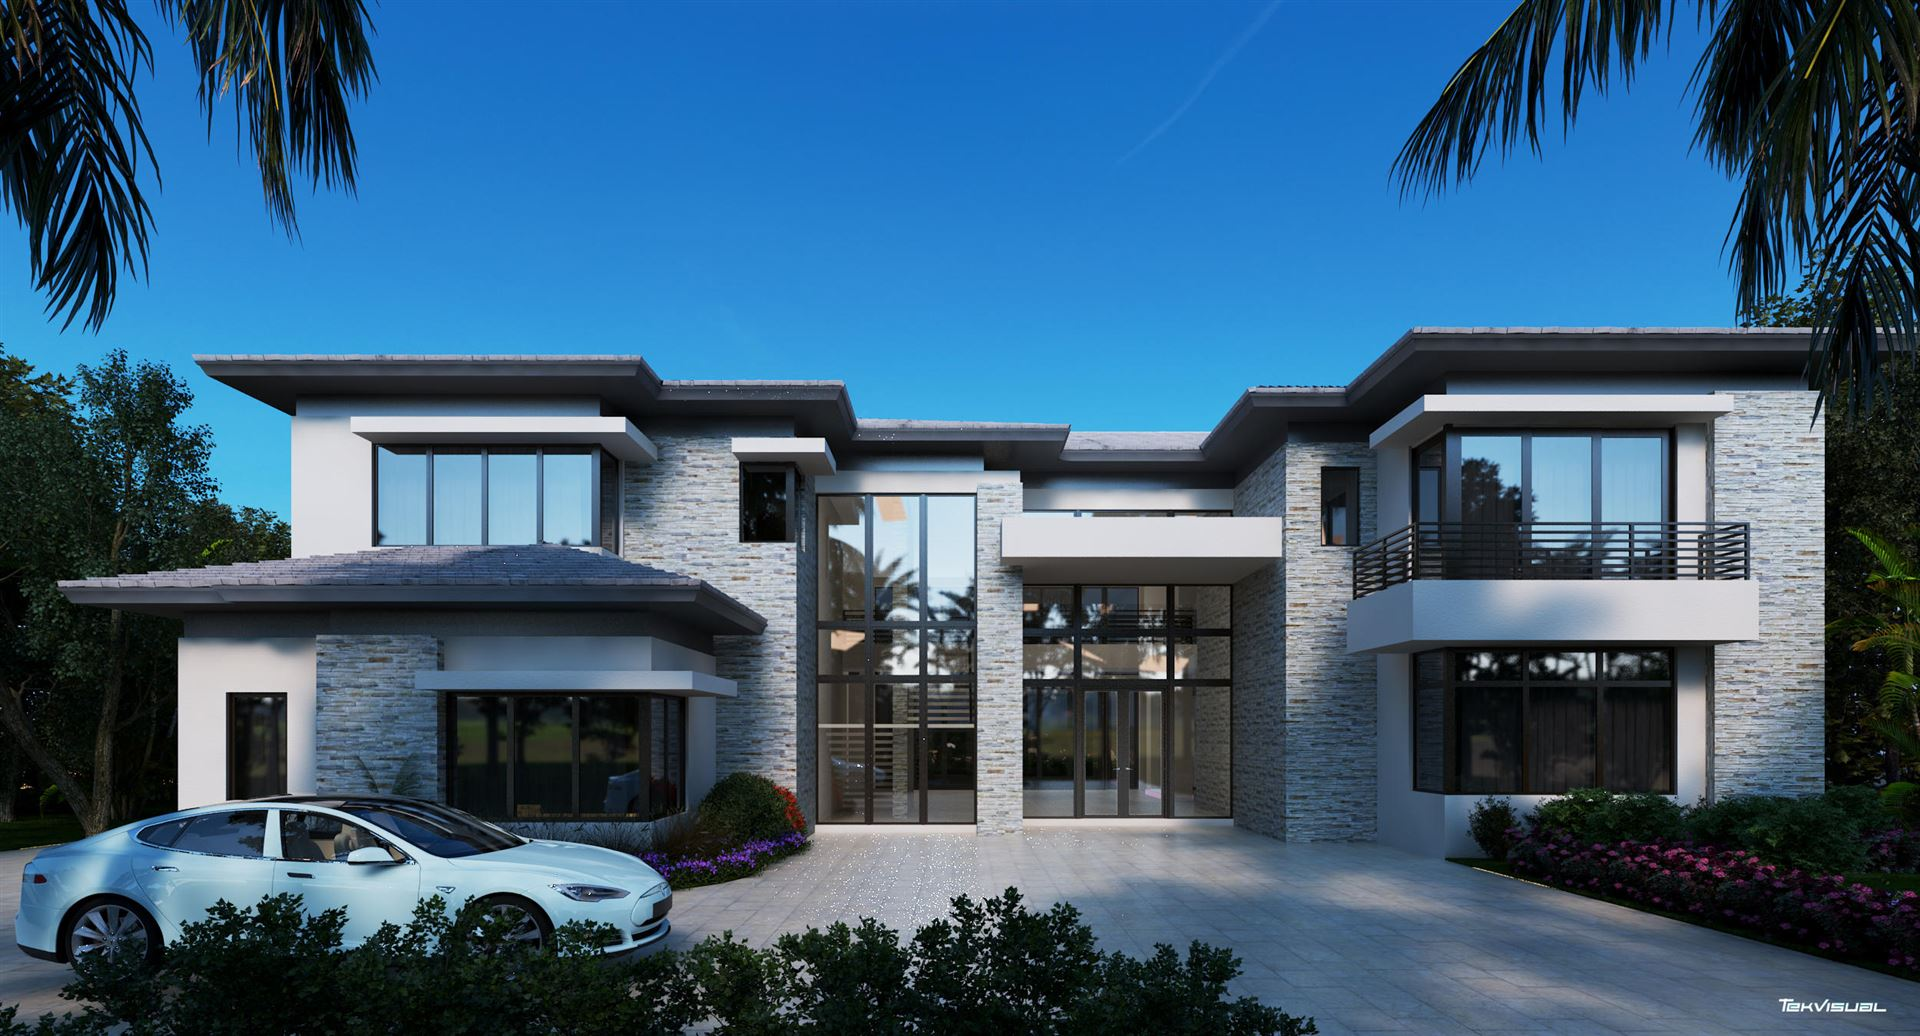 724 N Lake Avenue, Delray Beach, FL 33483 - #: RX-10572054